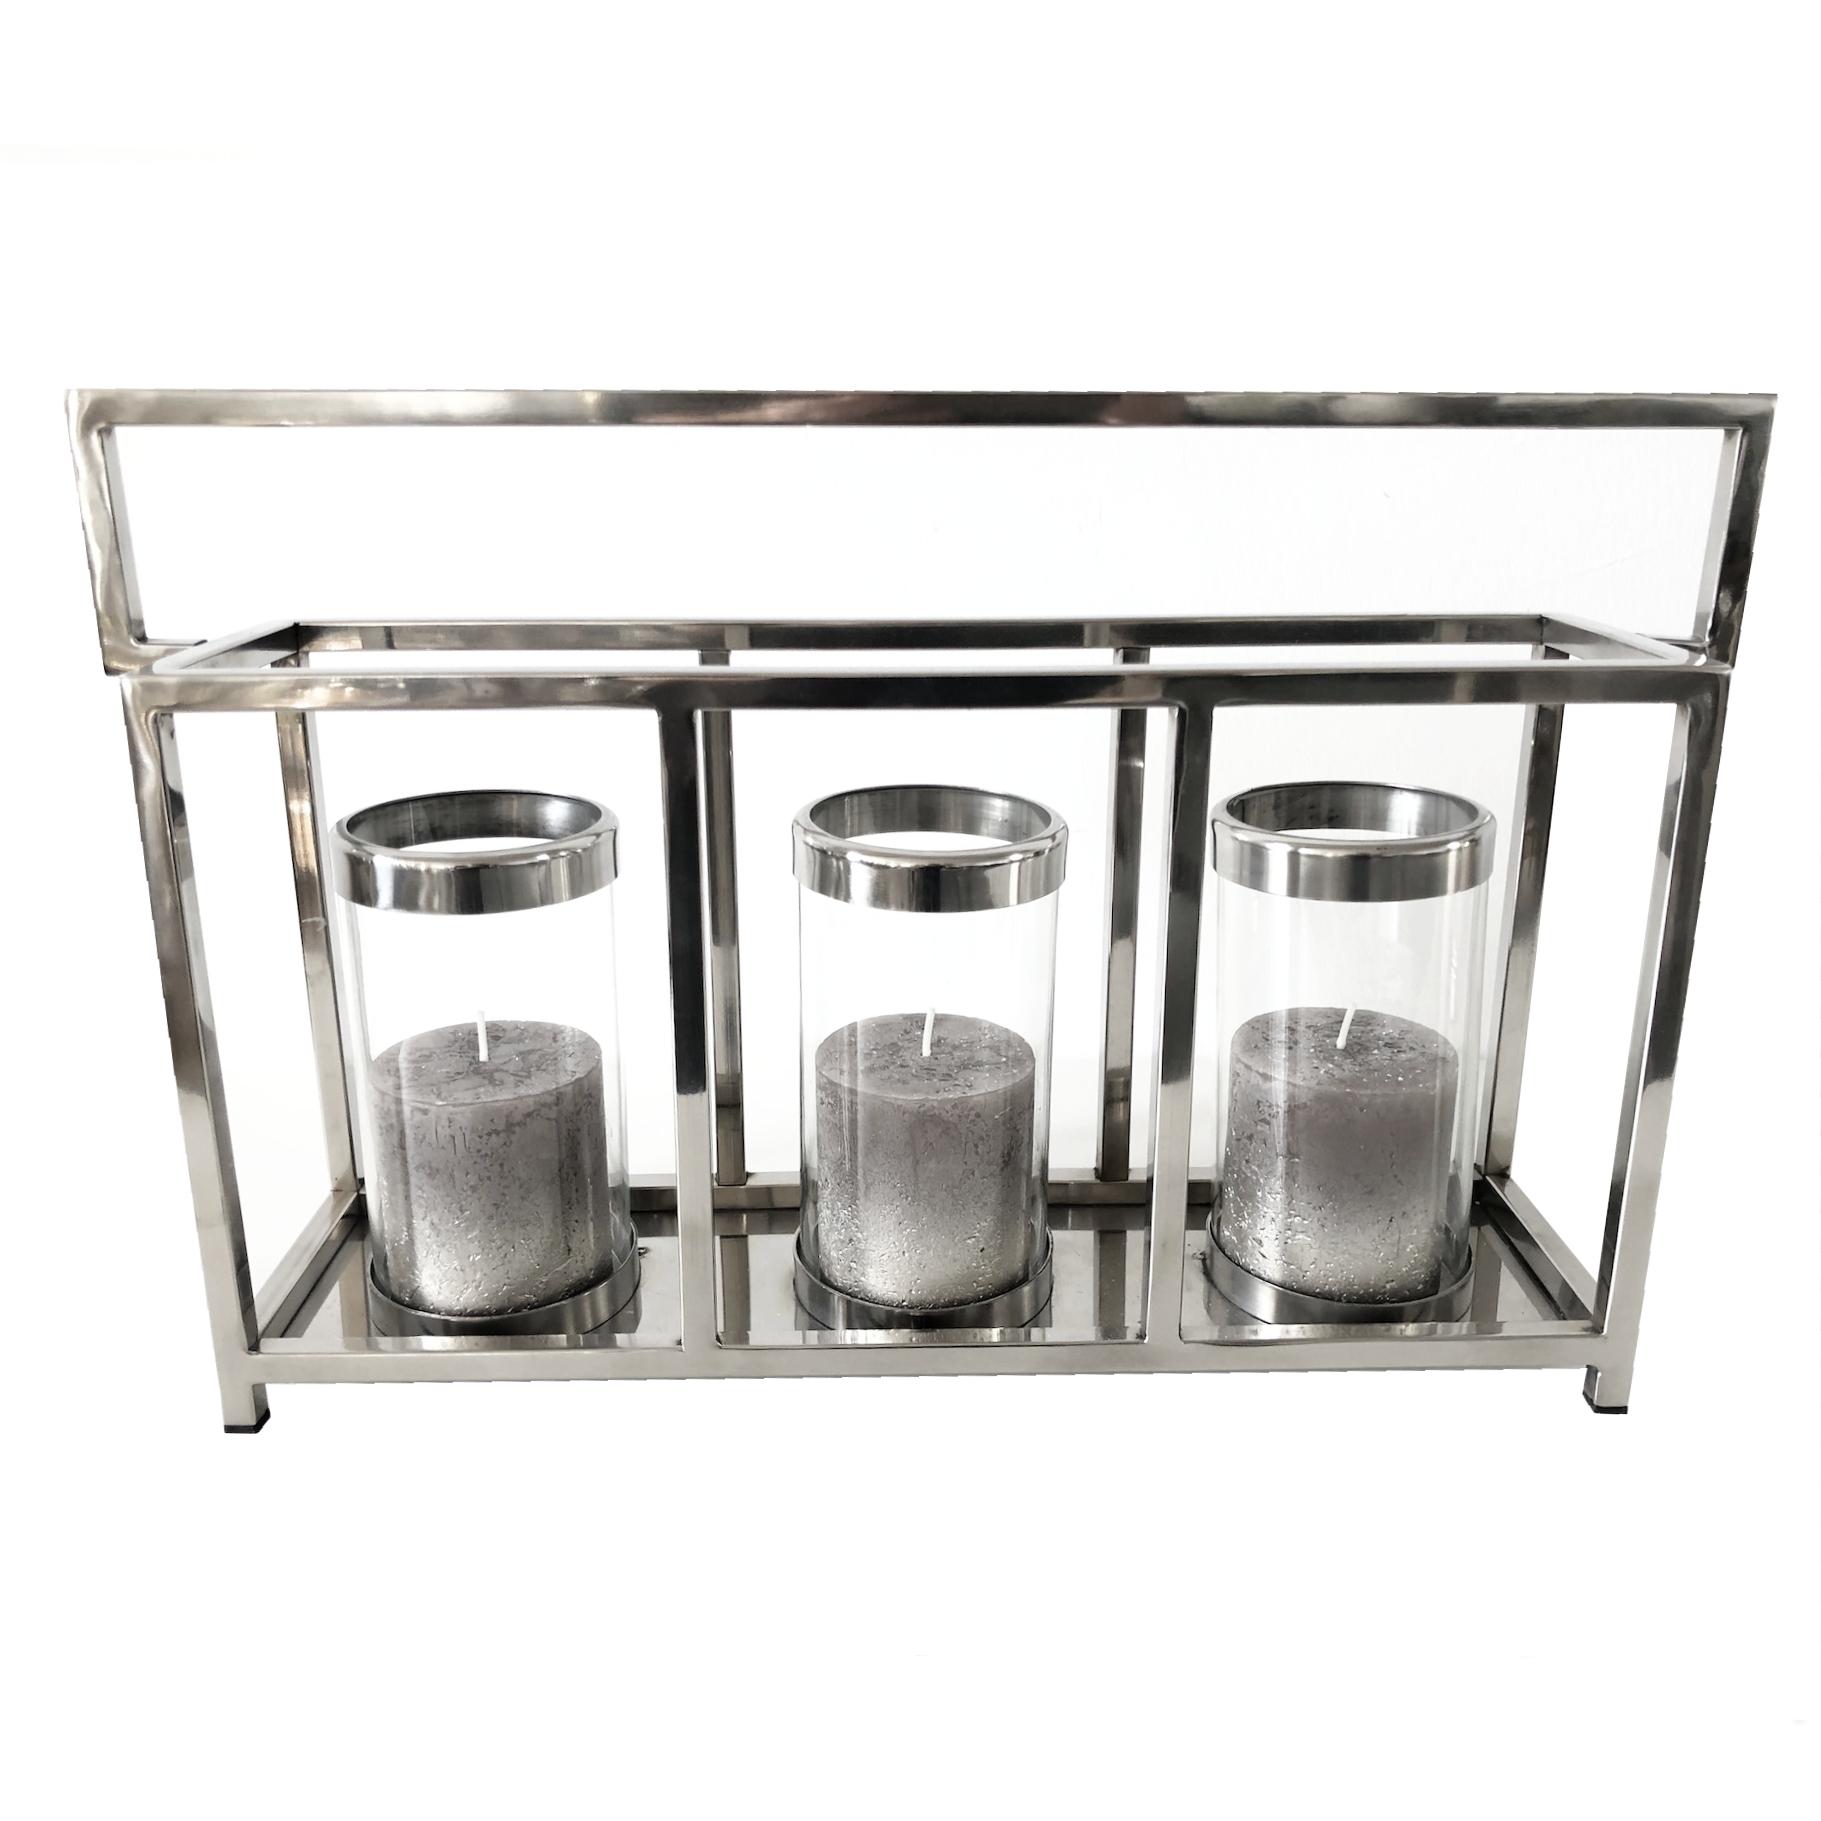 edles windlicht kerzenhalter alu glas l nglich silber. Black Bedroom Furniture Sets. Home Design Ideas